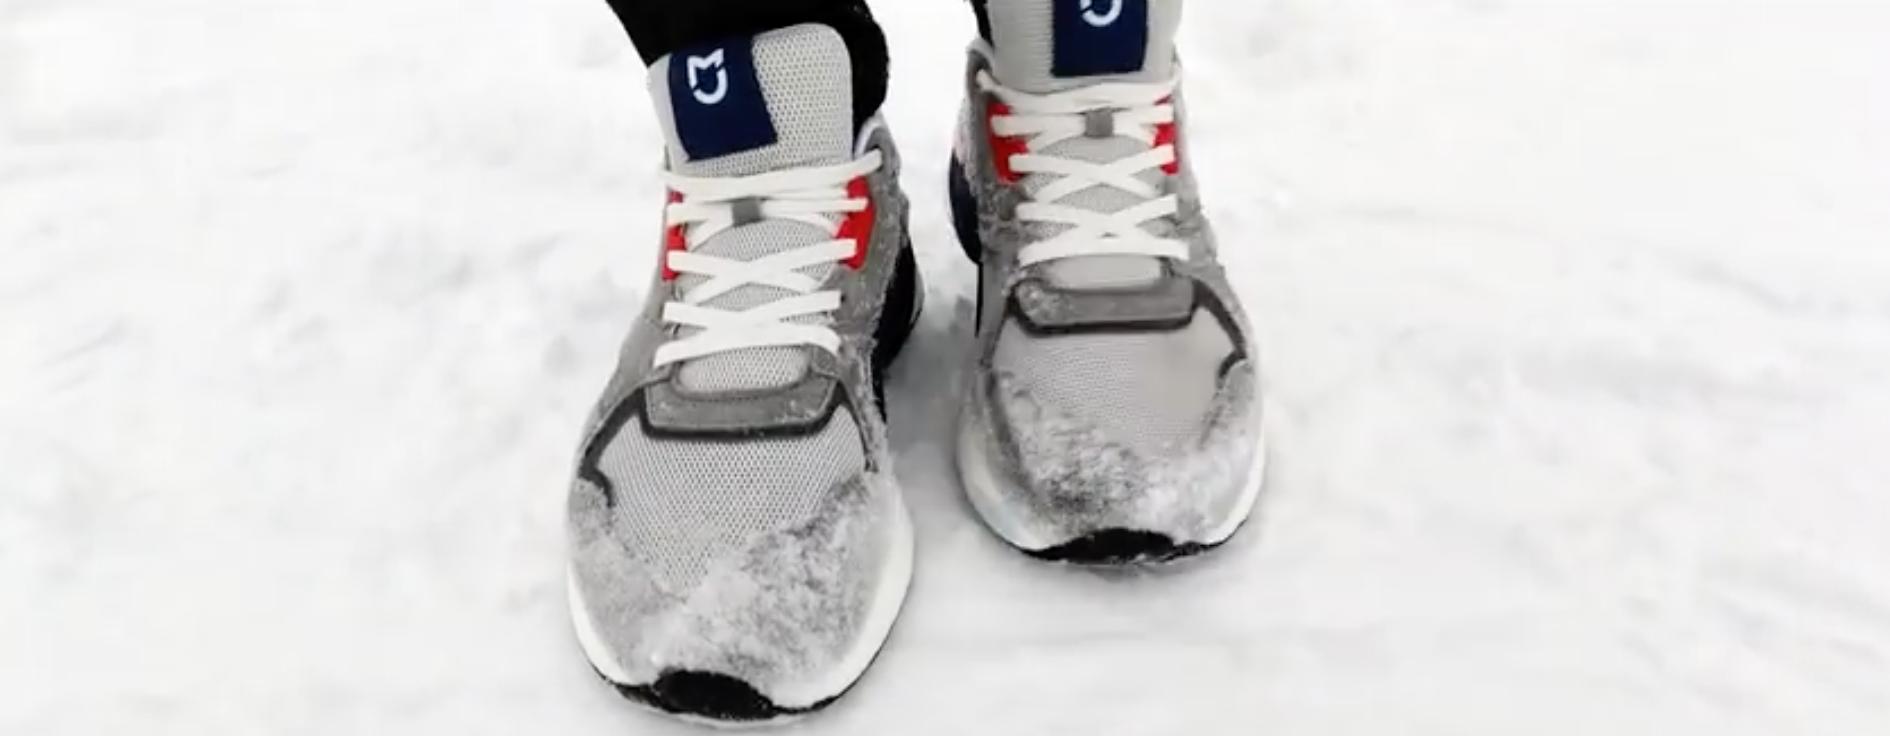 Xiaomi Mijia Retro Sneaker Review Comfortable Running Pair